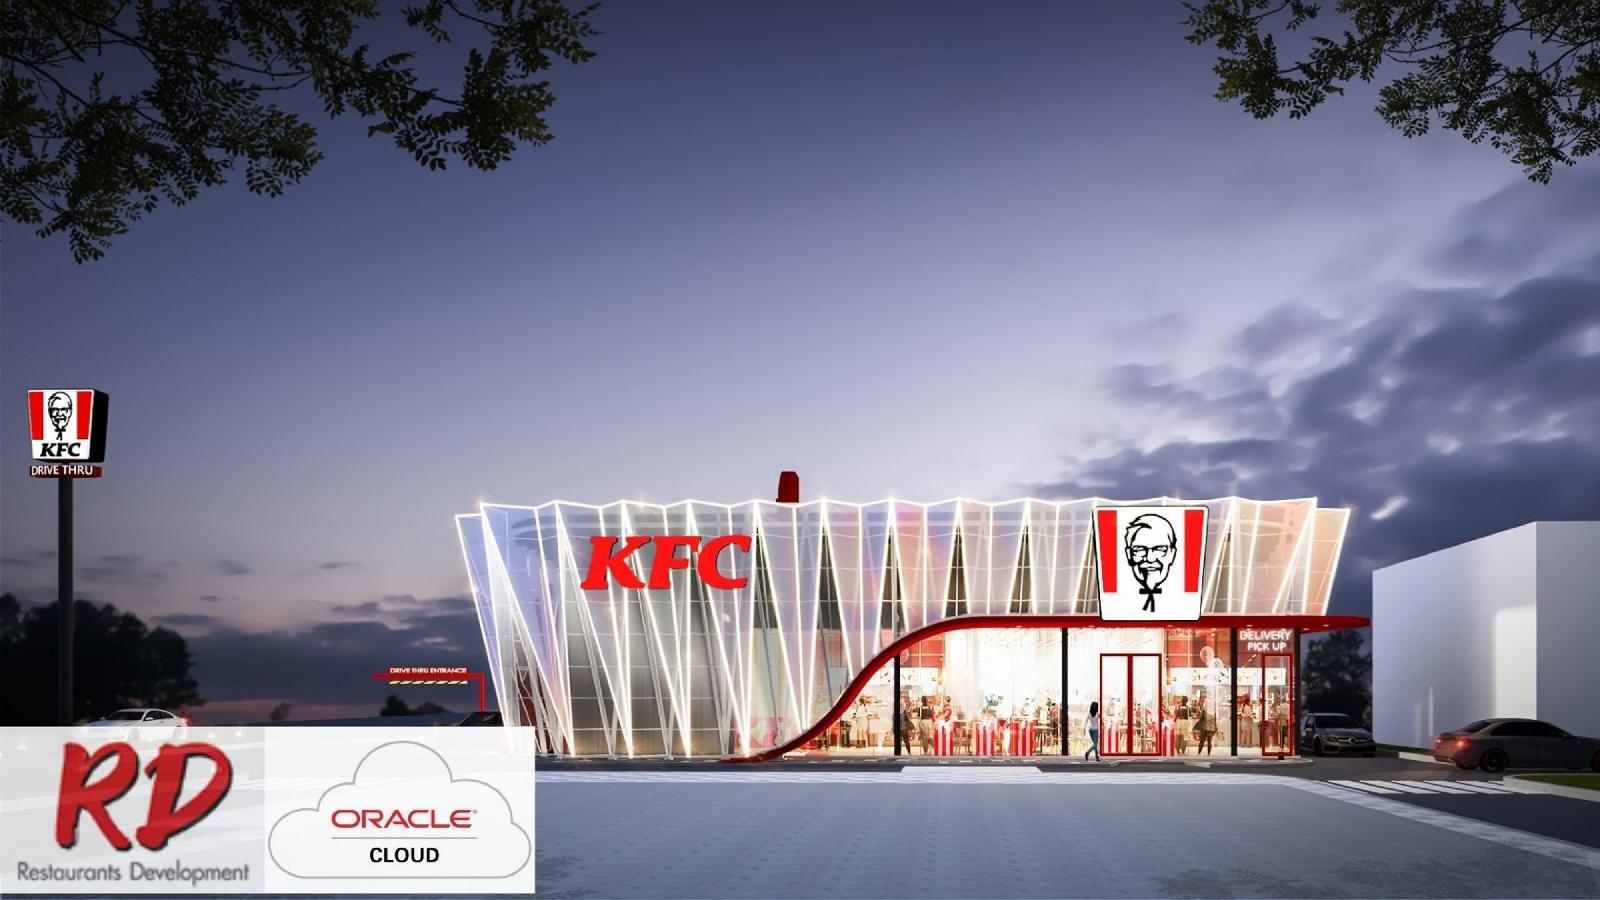 Restaurants Development ผนึก Oracle เดินหน้าธุรกิจอย่างไม่หยุดยั้ง ด้วย Oracle Fusion Cloud ERP รองรับมากกว่า 200 สาขาภายใต้แบรนด์ KFC